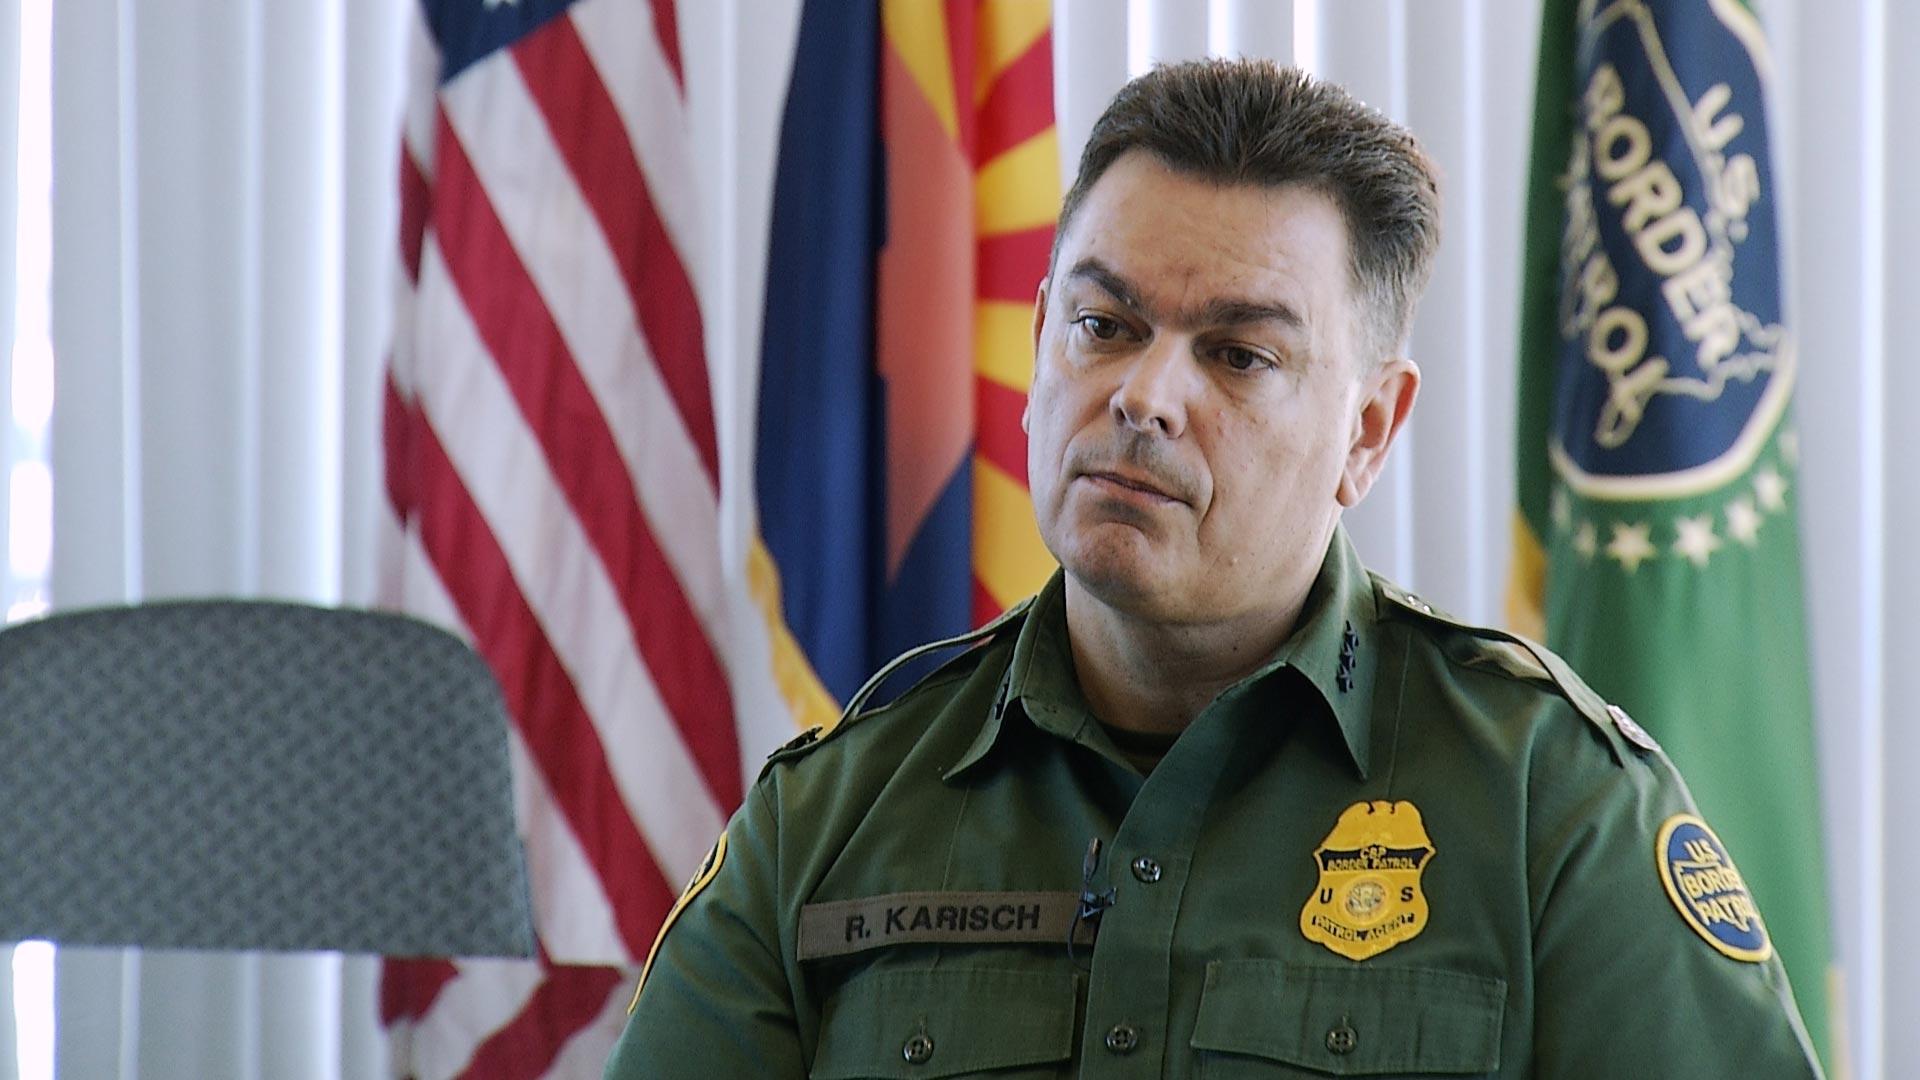 Border Patrol Tucson Sector Chief Rodolfo Karisch